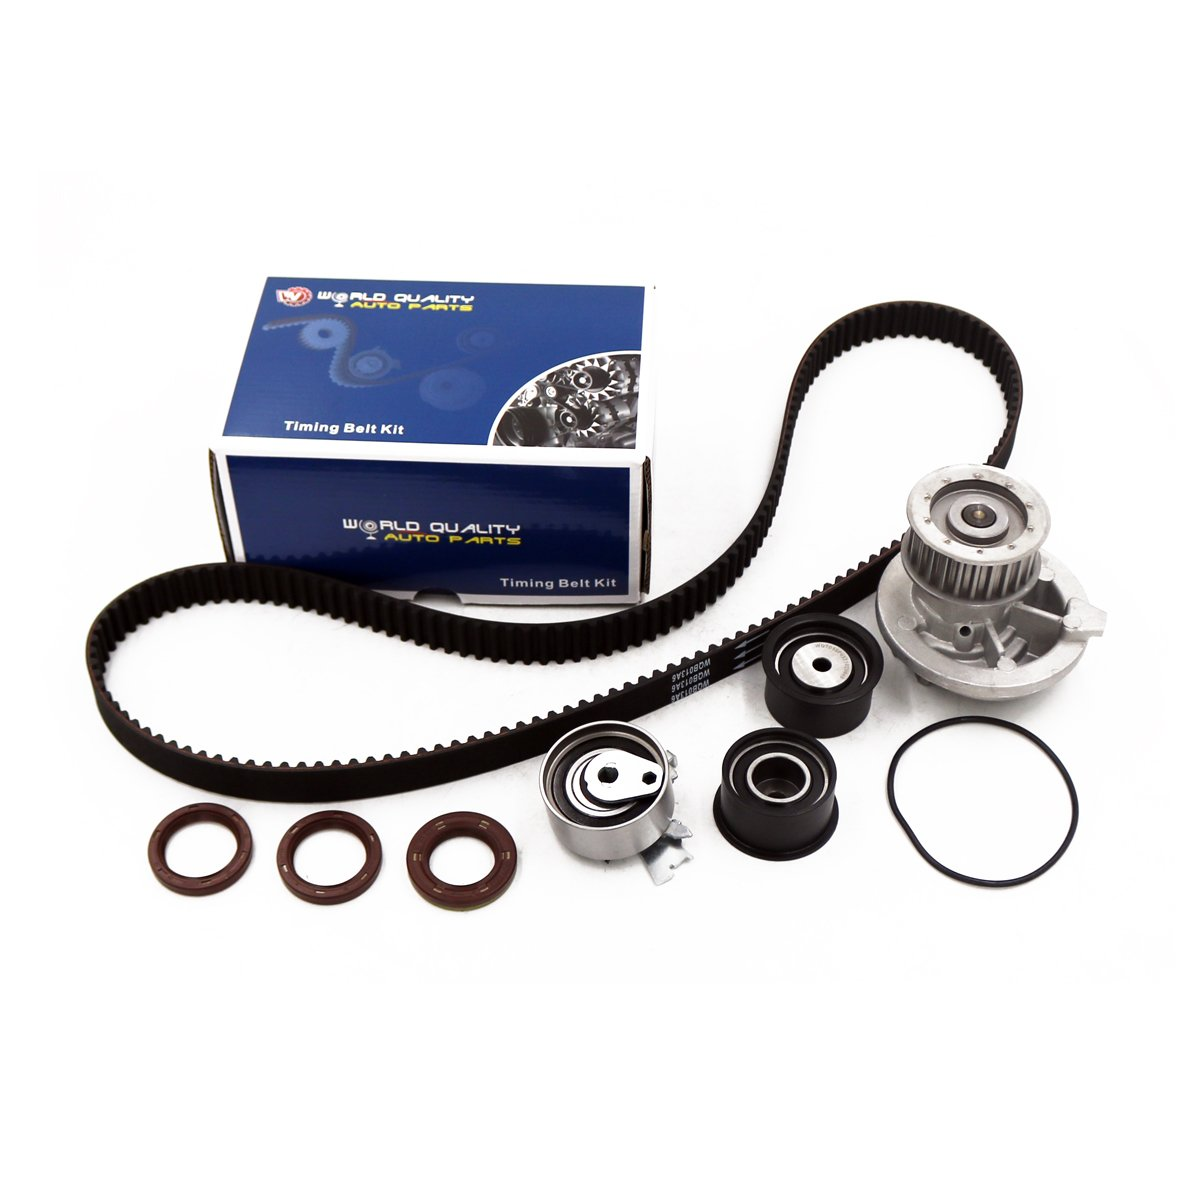 Timing Belt Kit Water Pump W Tensioner For 1999 2007 Chevrolet Optra 2000 Saturn Daewoo Nubira